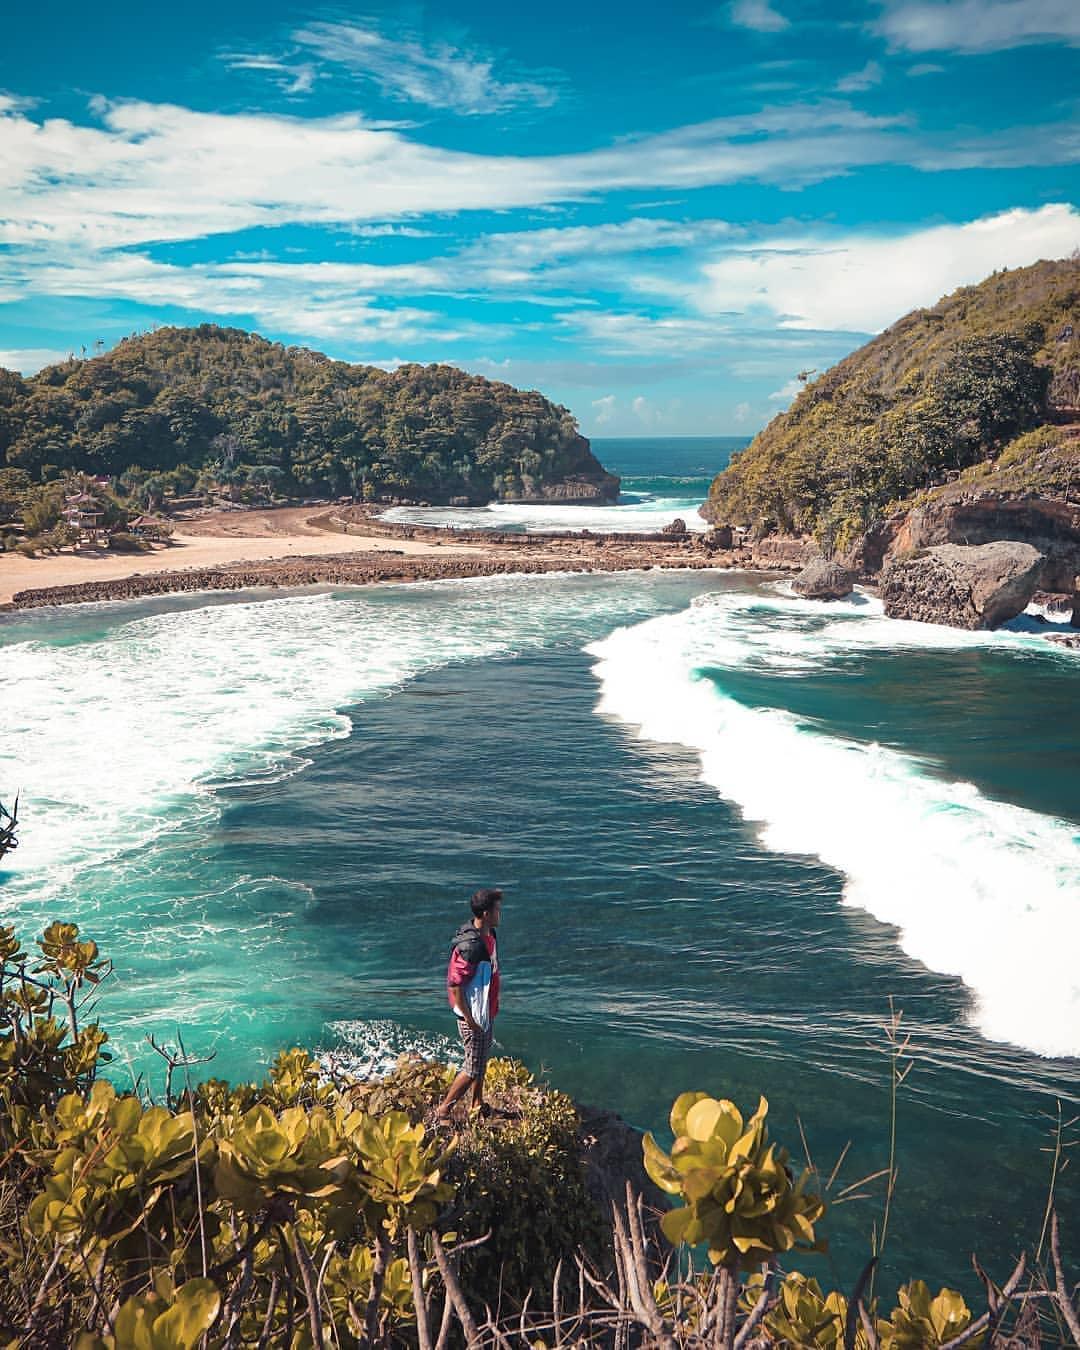 20 Wisata Jawa Timur Berbujet Murah Yang Wajib Dikunjungi